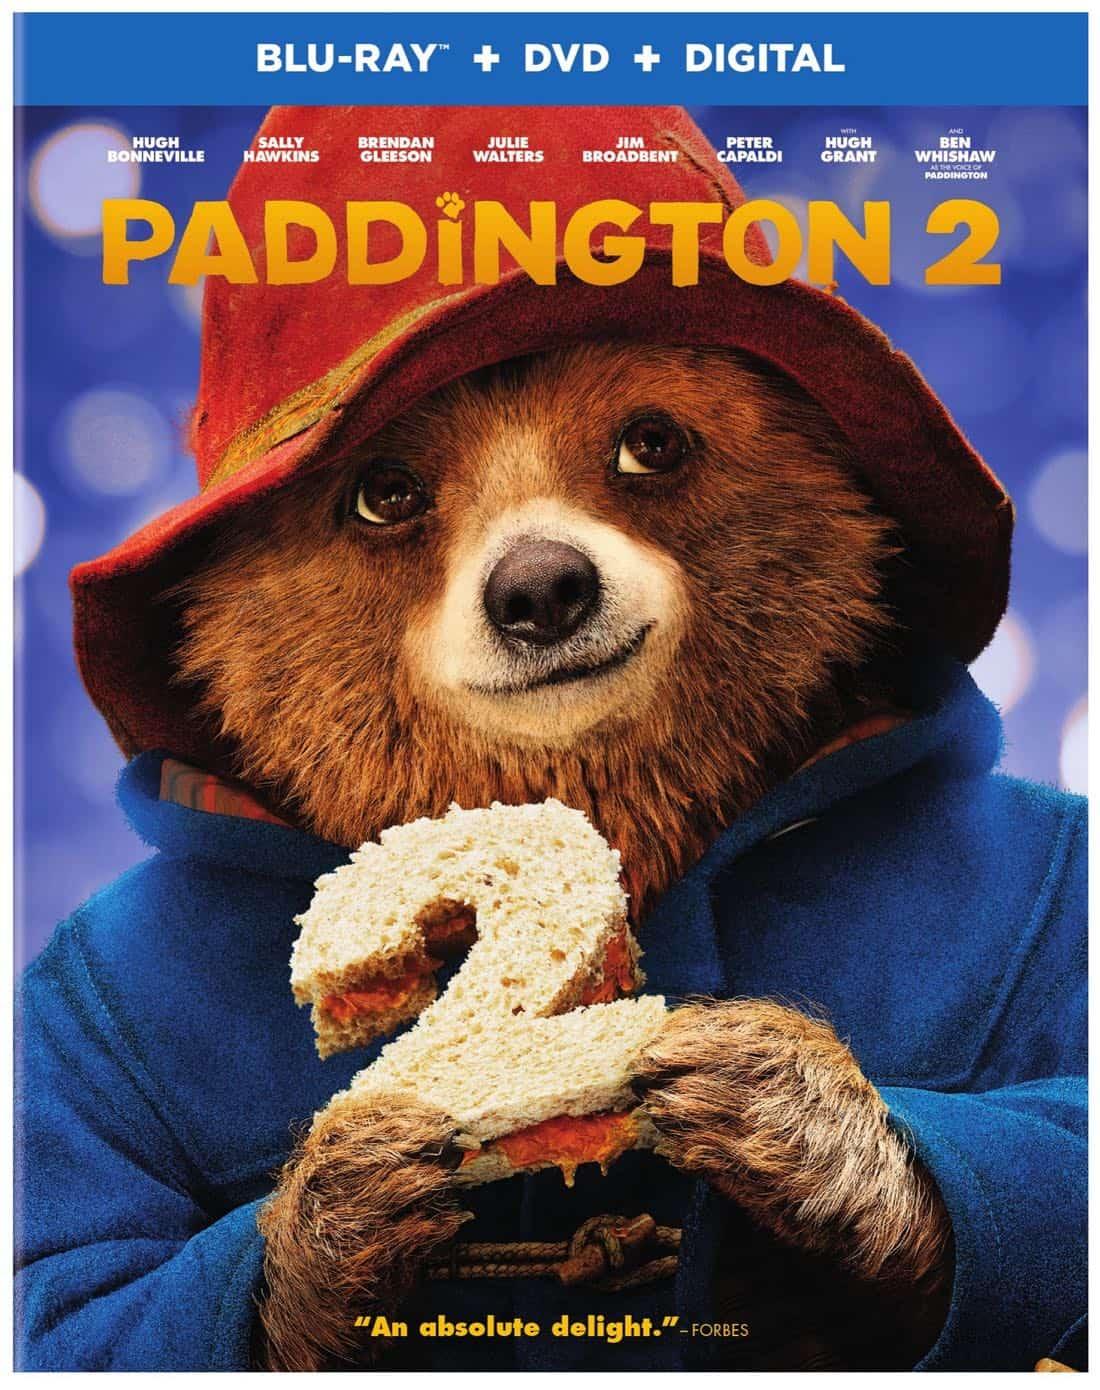 Paddington-2-Bluray-DVD-Digital-Box-Cover-Artwork